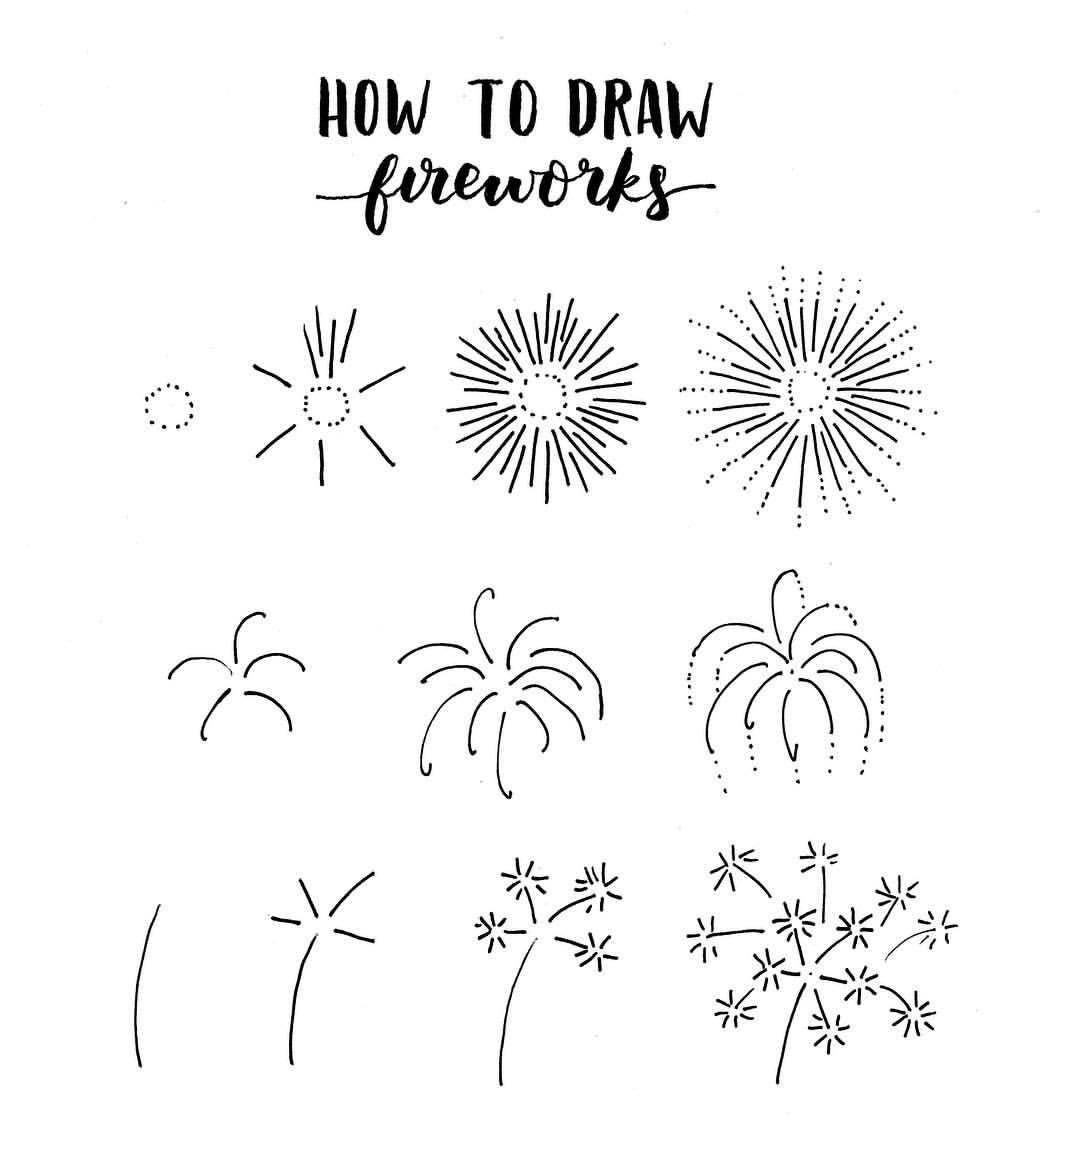 Elements Of Art Line Quizlet : Vuurwerk bullet journal pinterest doodles february